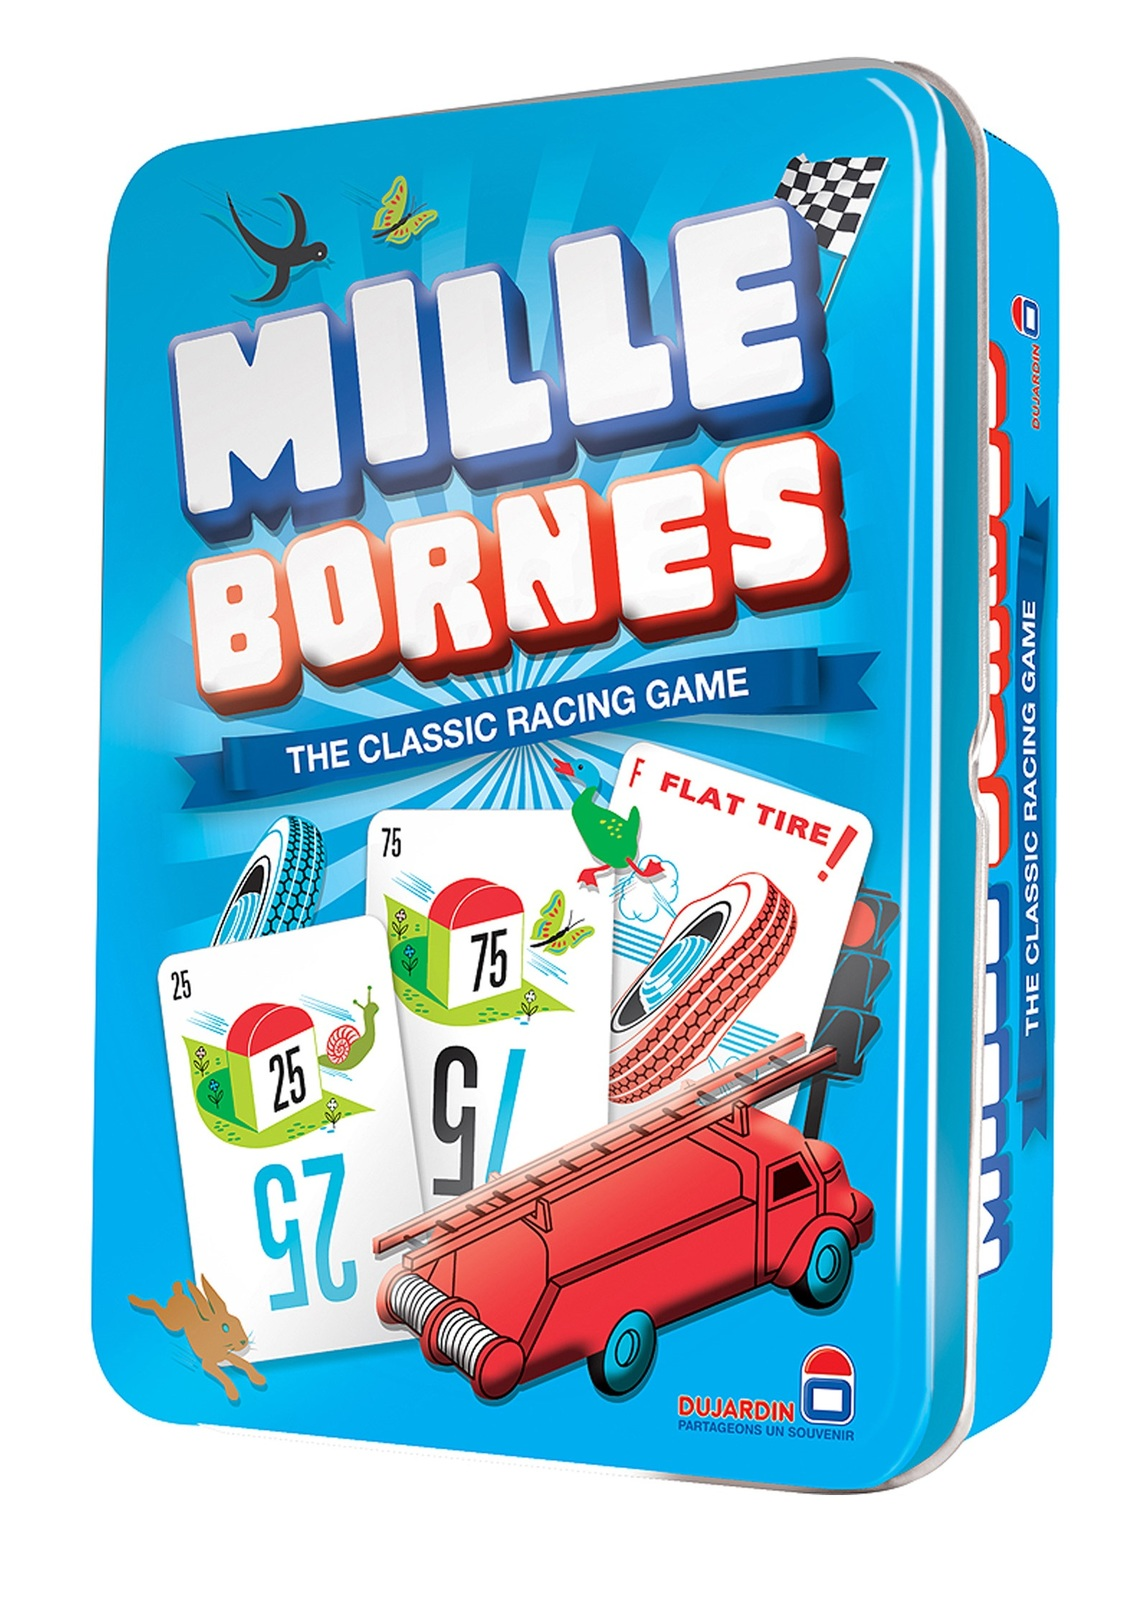 Mille Bornes - Card game image